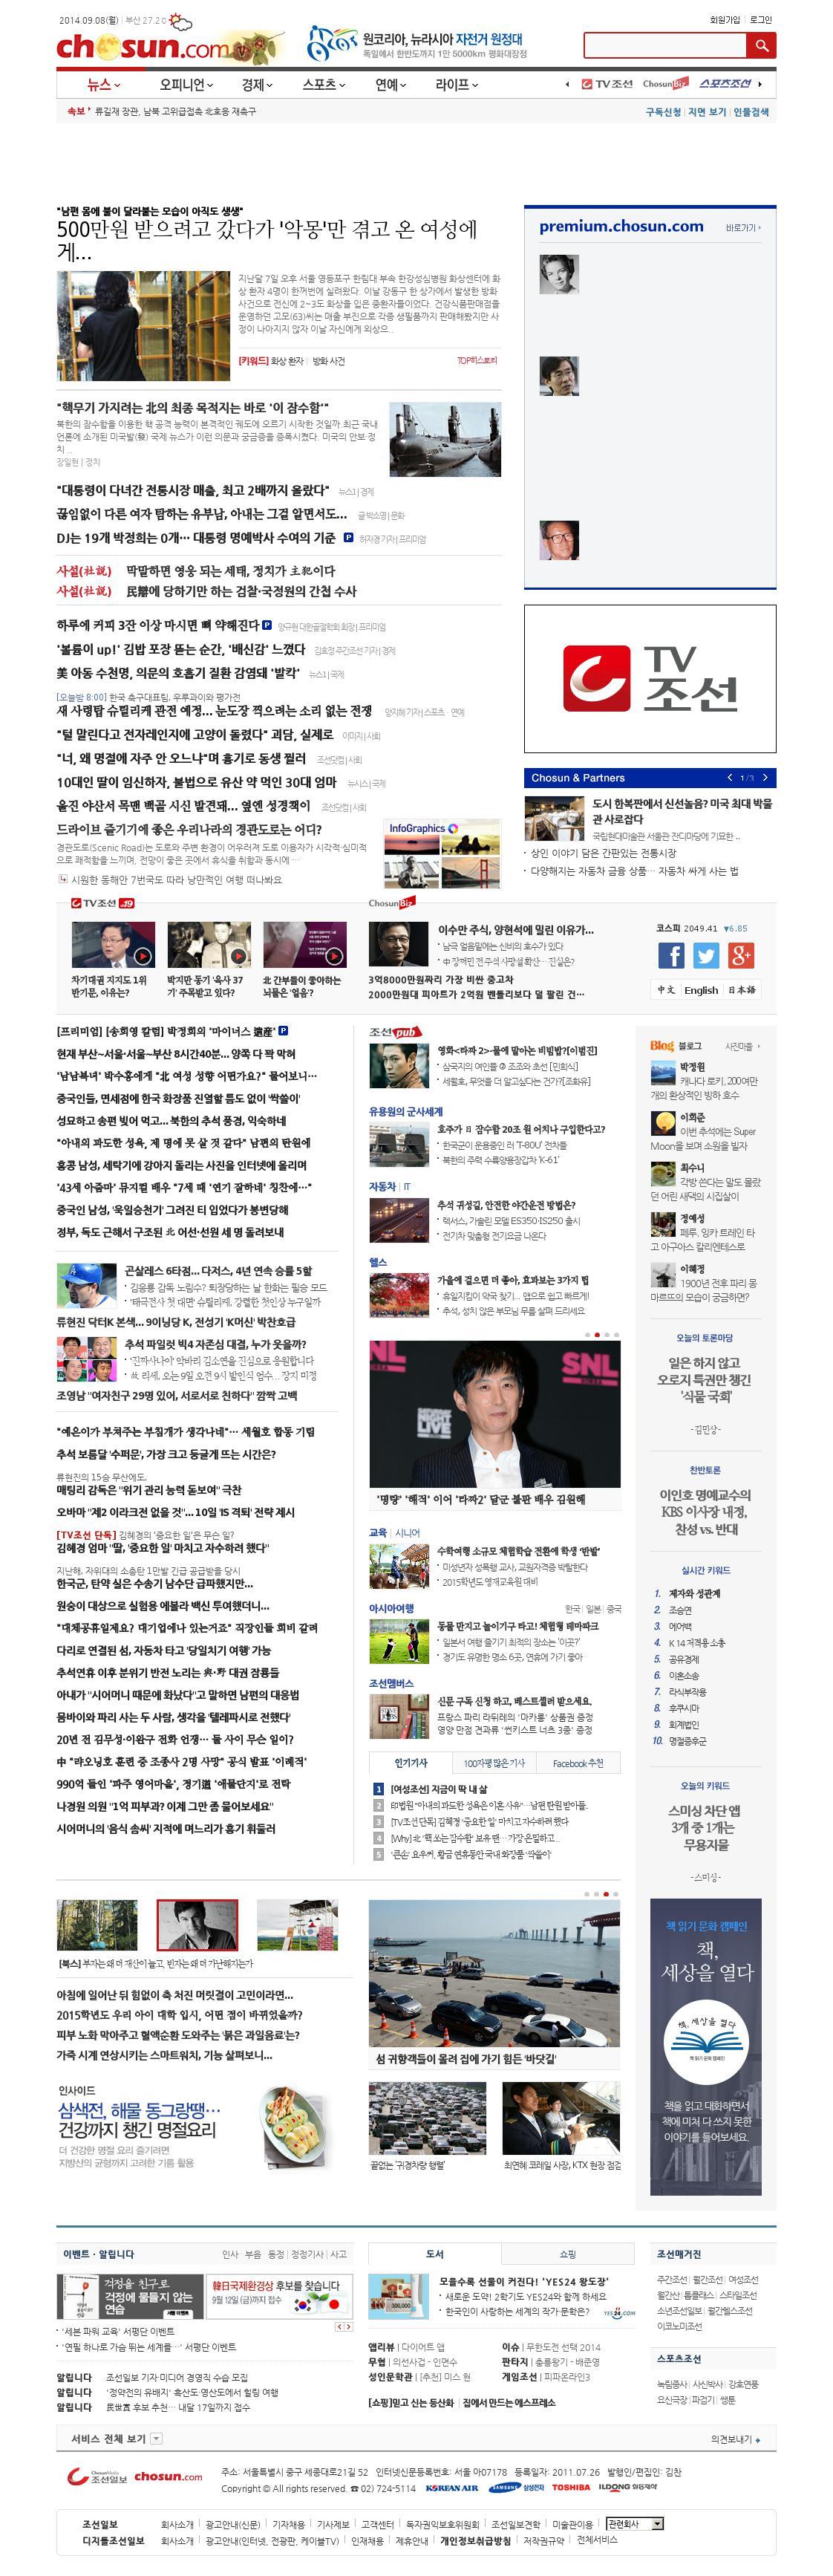 chosun.com at Monday Sept. 8, 2014, 6:02 a.m. UTC